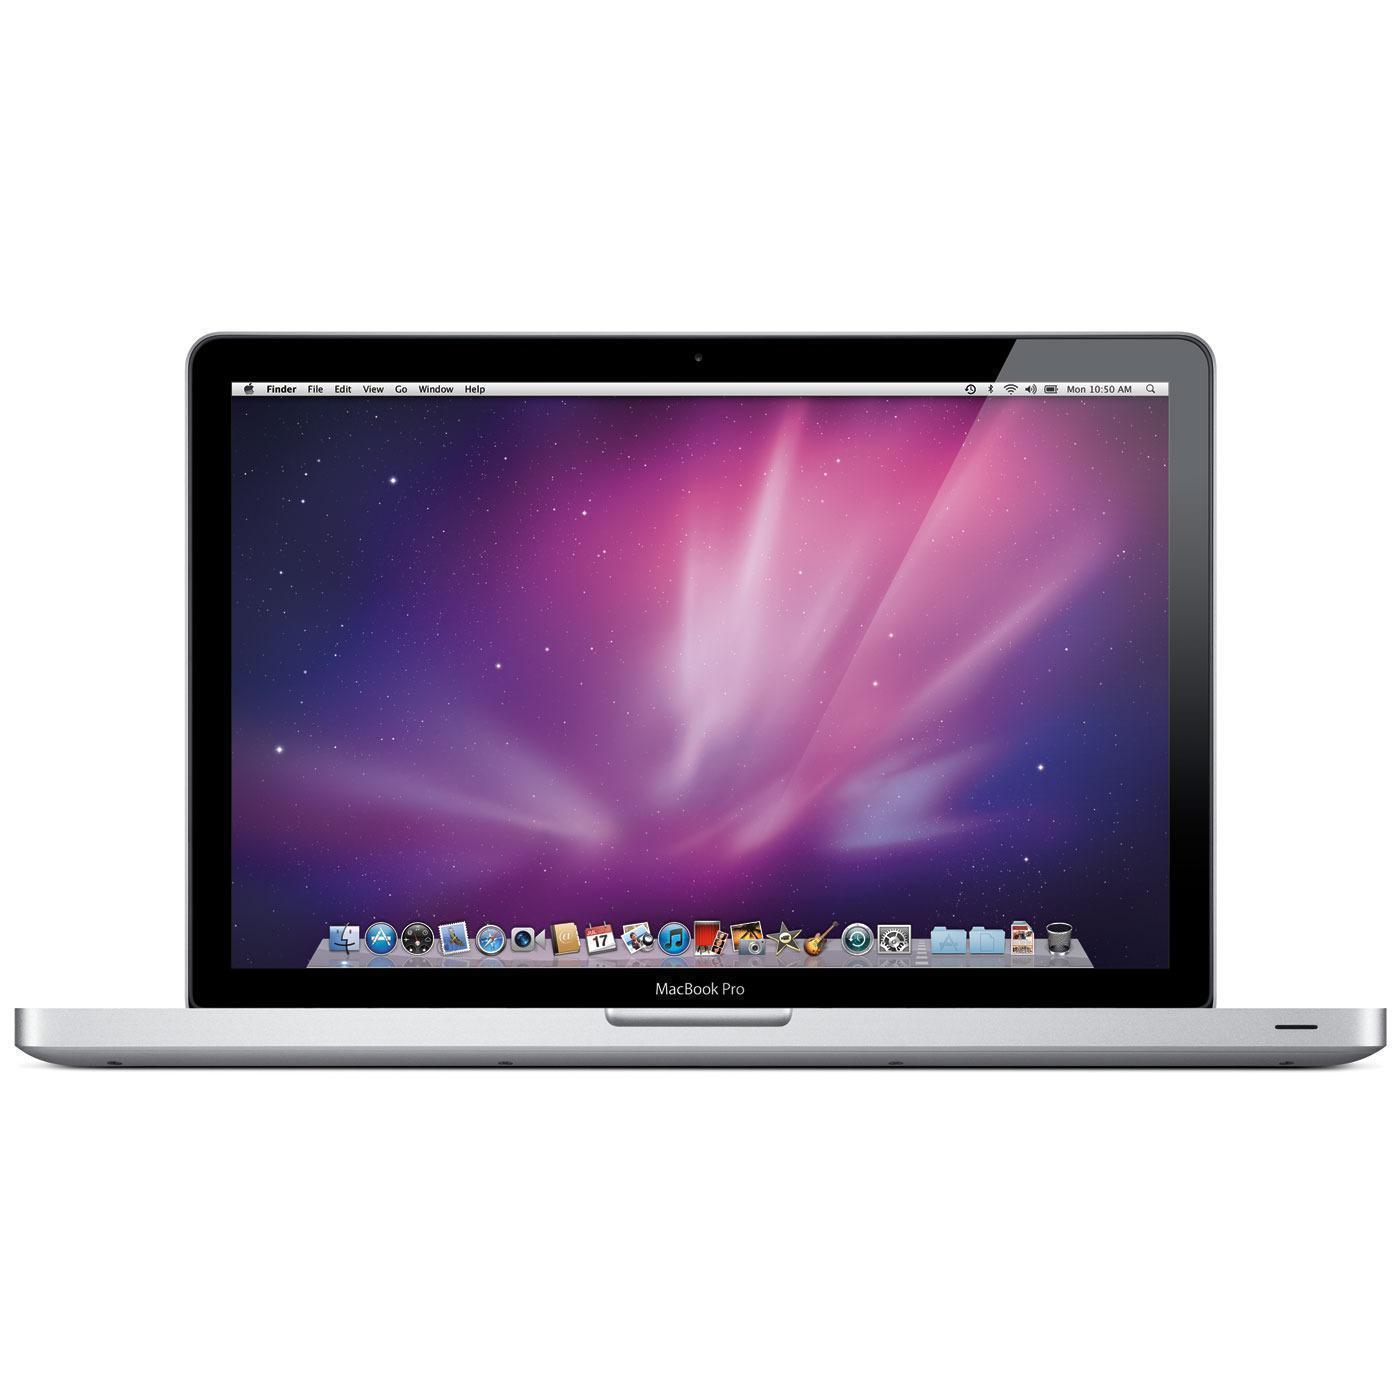 "MacBook Pro 17"" Core i5 2,53 GHz - HDD 500 Go - RAM 4 Go"